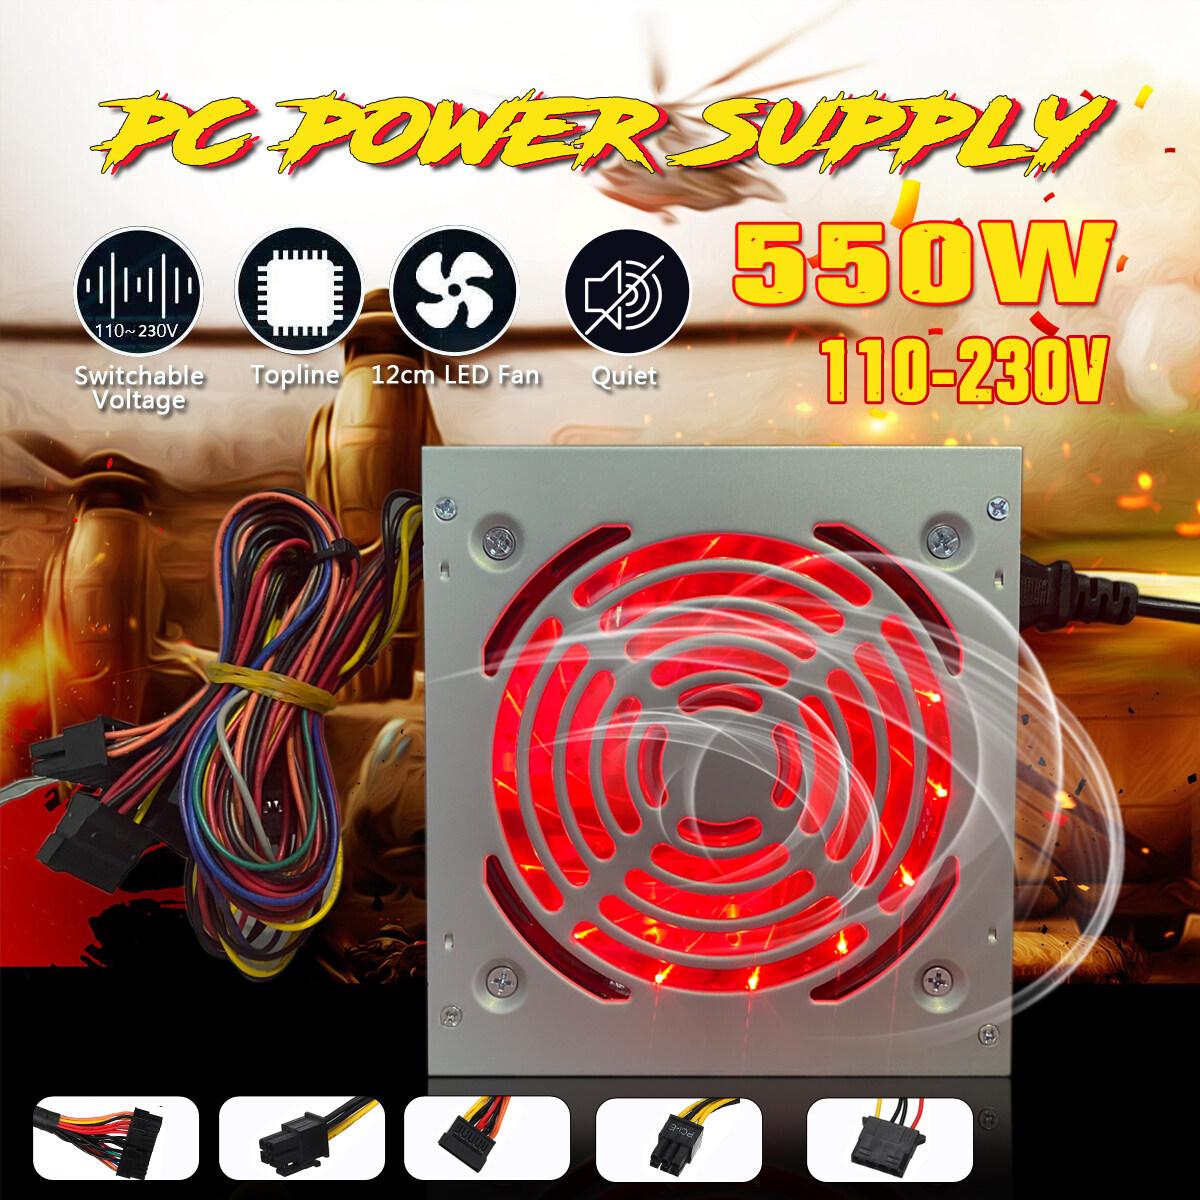 ATX 12V 1.3 530W/550W Passive Pc Power Supply EU Plug LED Red Lamp Case Power Supply